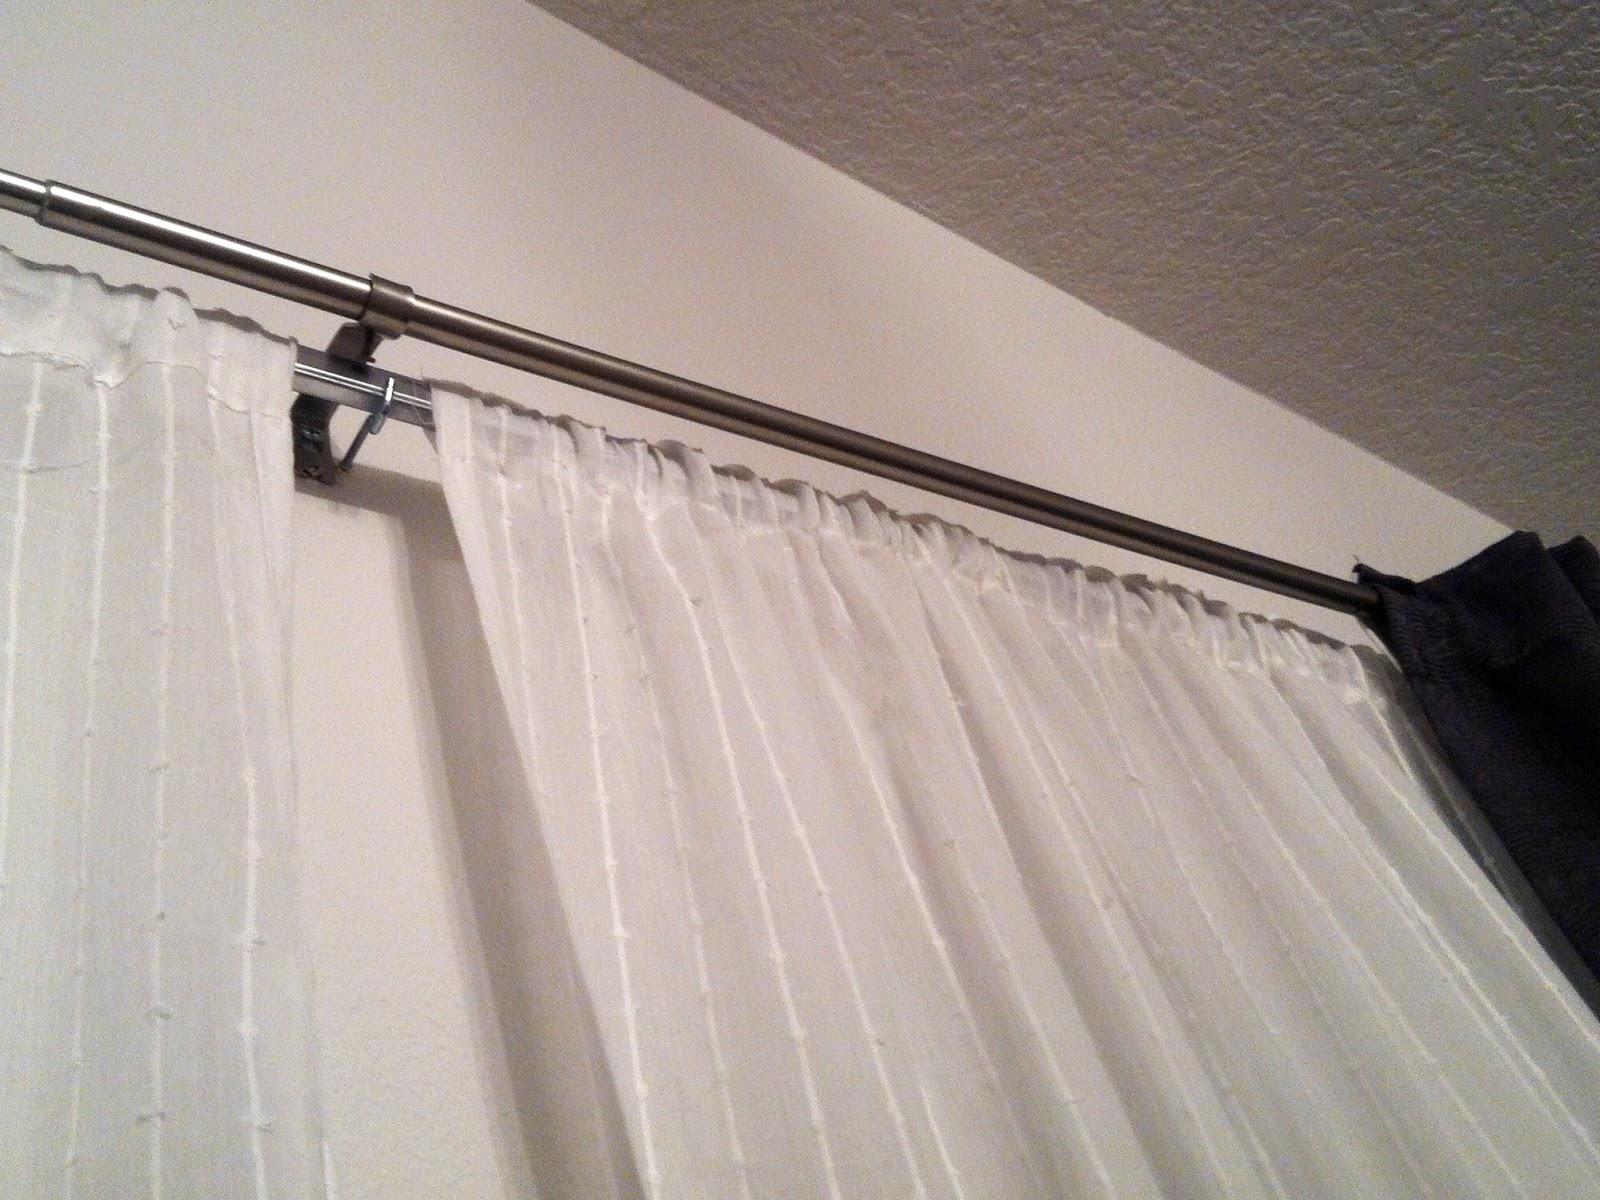 Tension Curtain Rods Ikea  HomesFeed